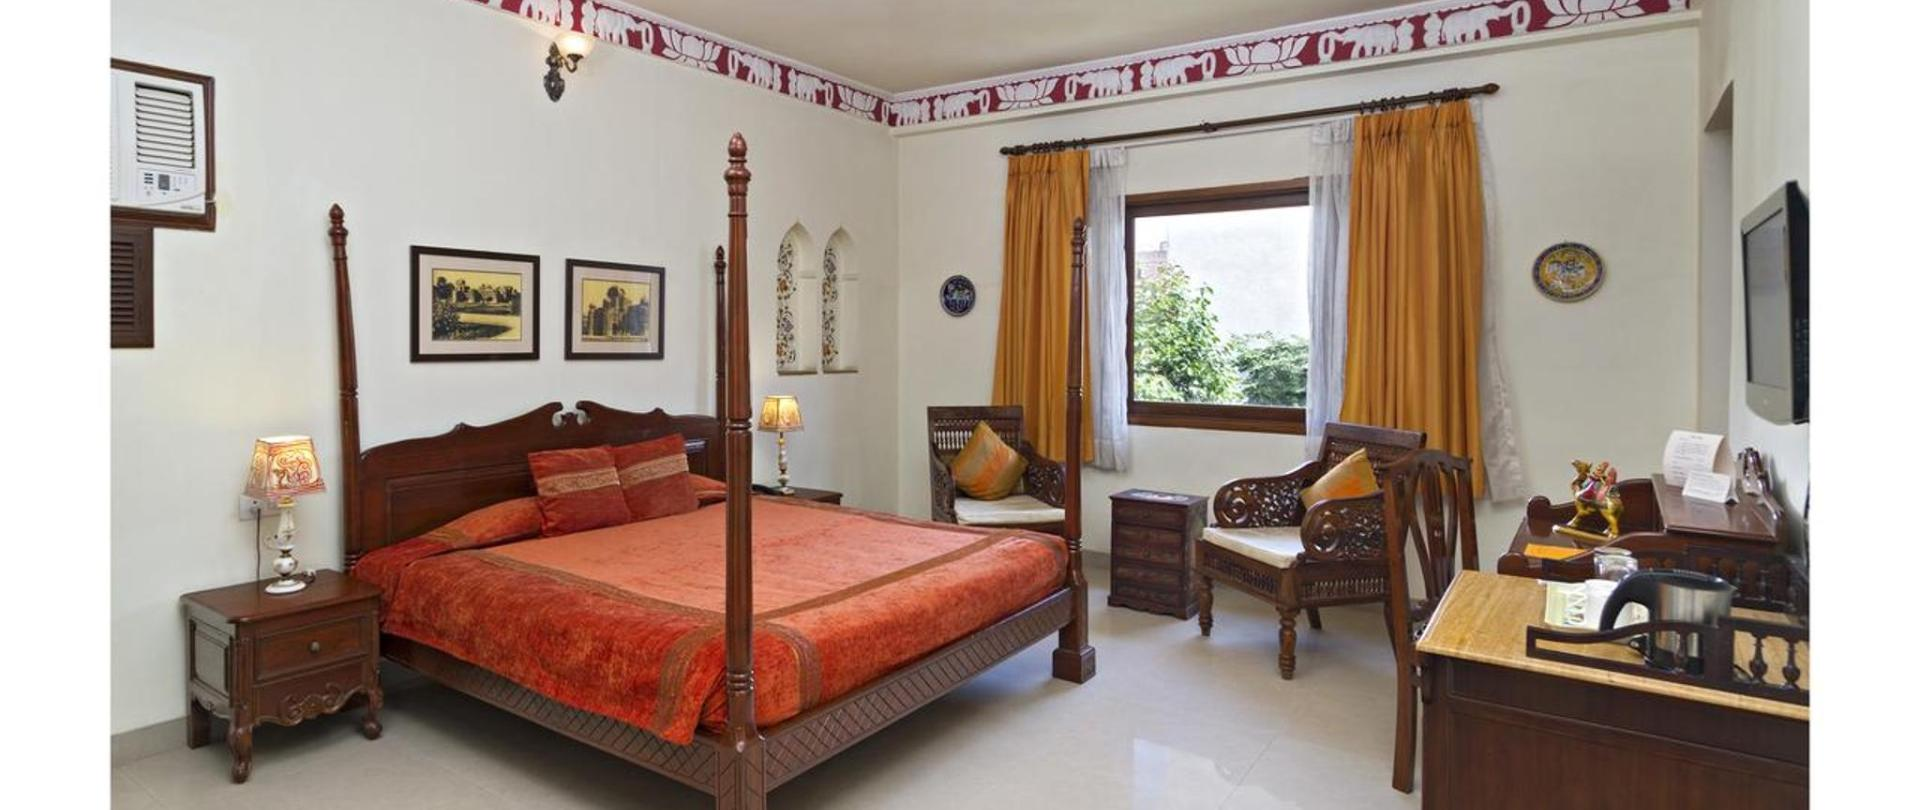 Jaipur Hotel Best Hotel Jaipur Hotel Jaipur India Heritage Hotel